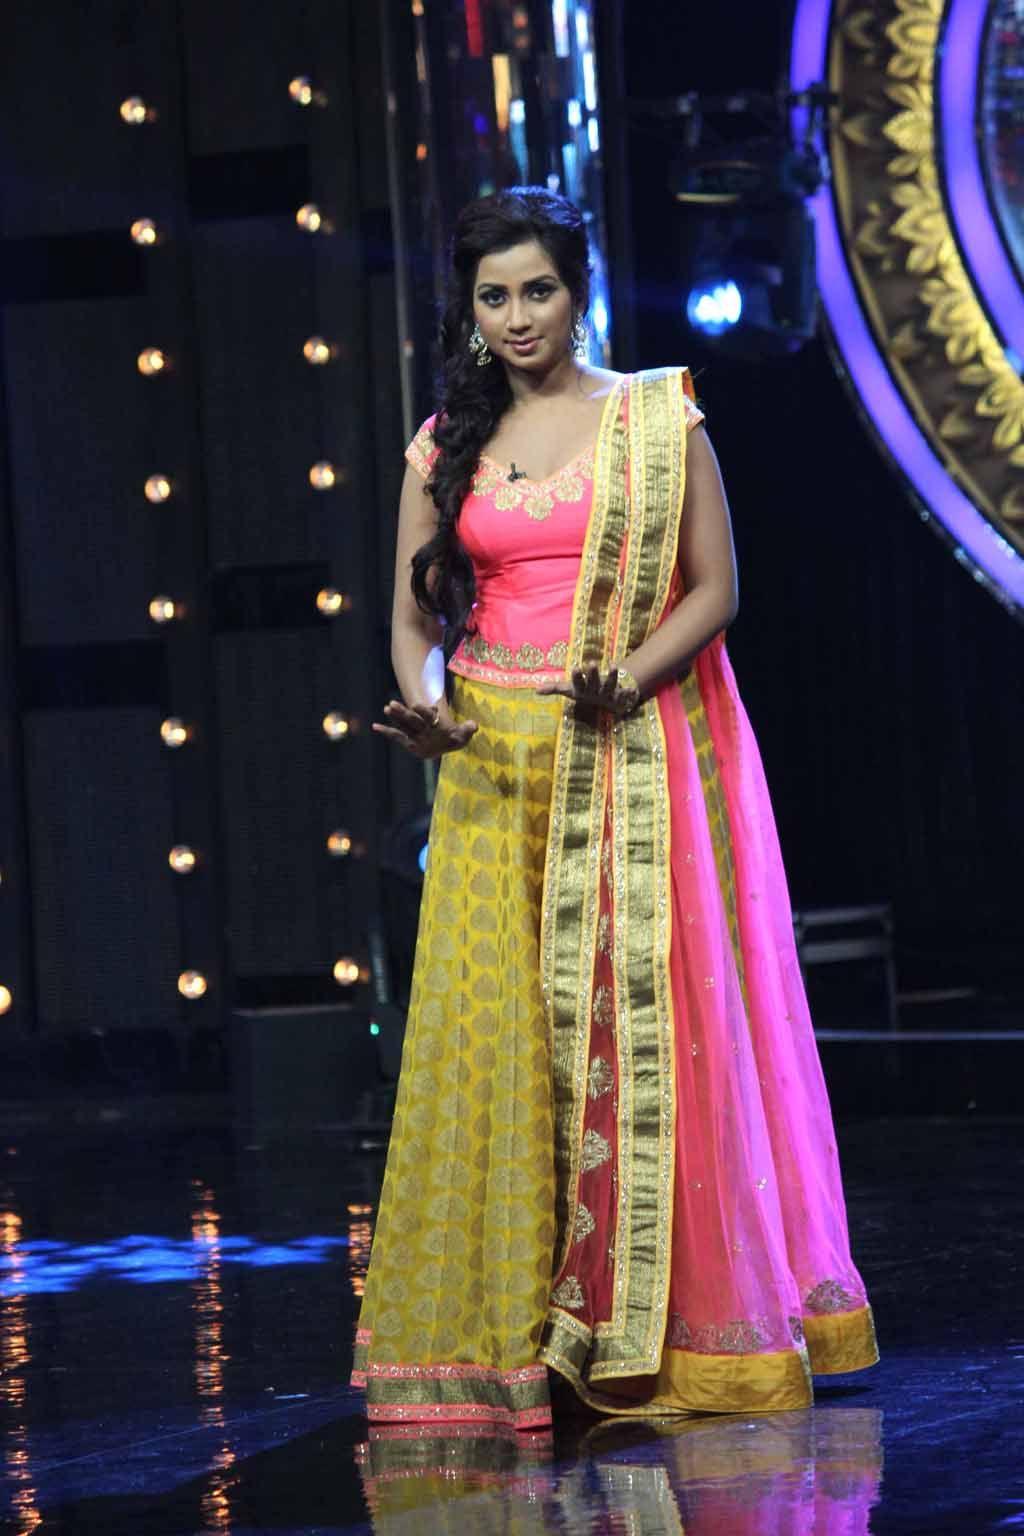 Shreya Ghoshal Sexy Lehenga At Indian Idol 2013 - Masala -1910